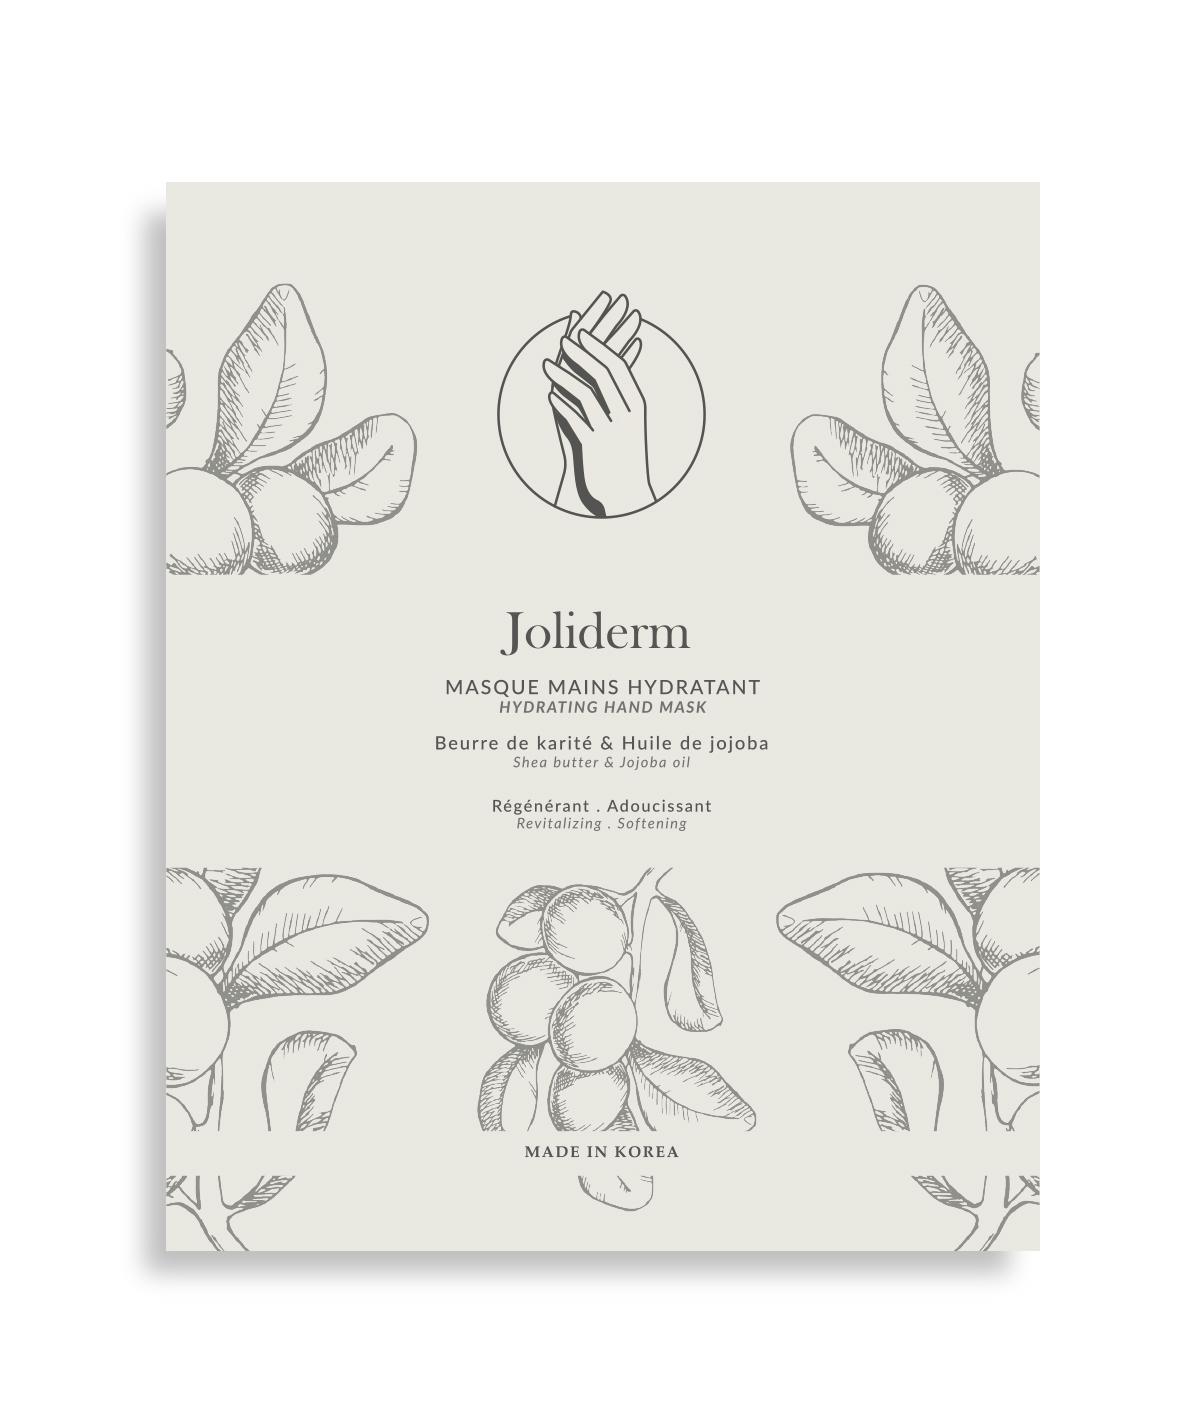 Masque-mains-hydratant-Joliderm